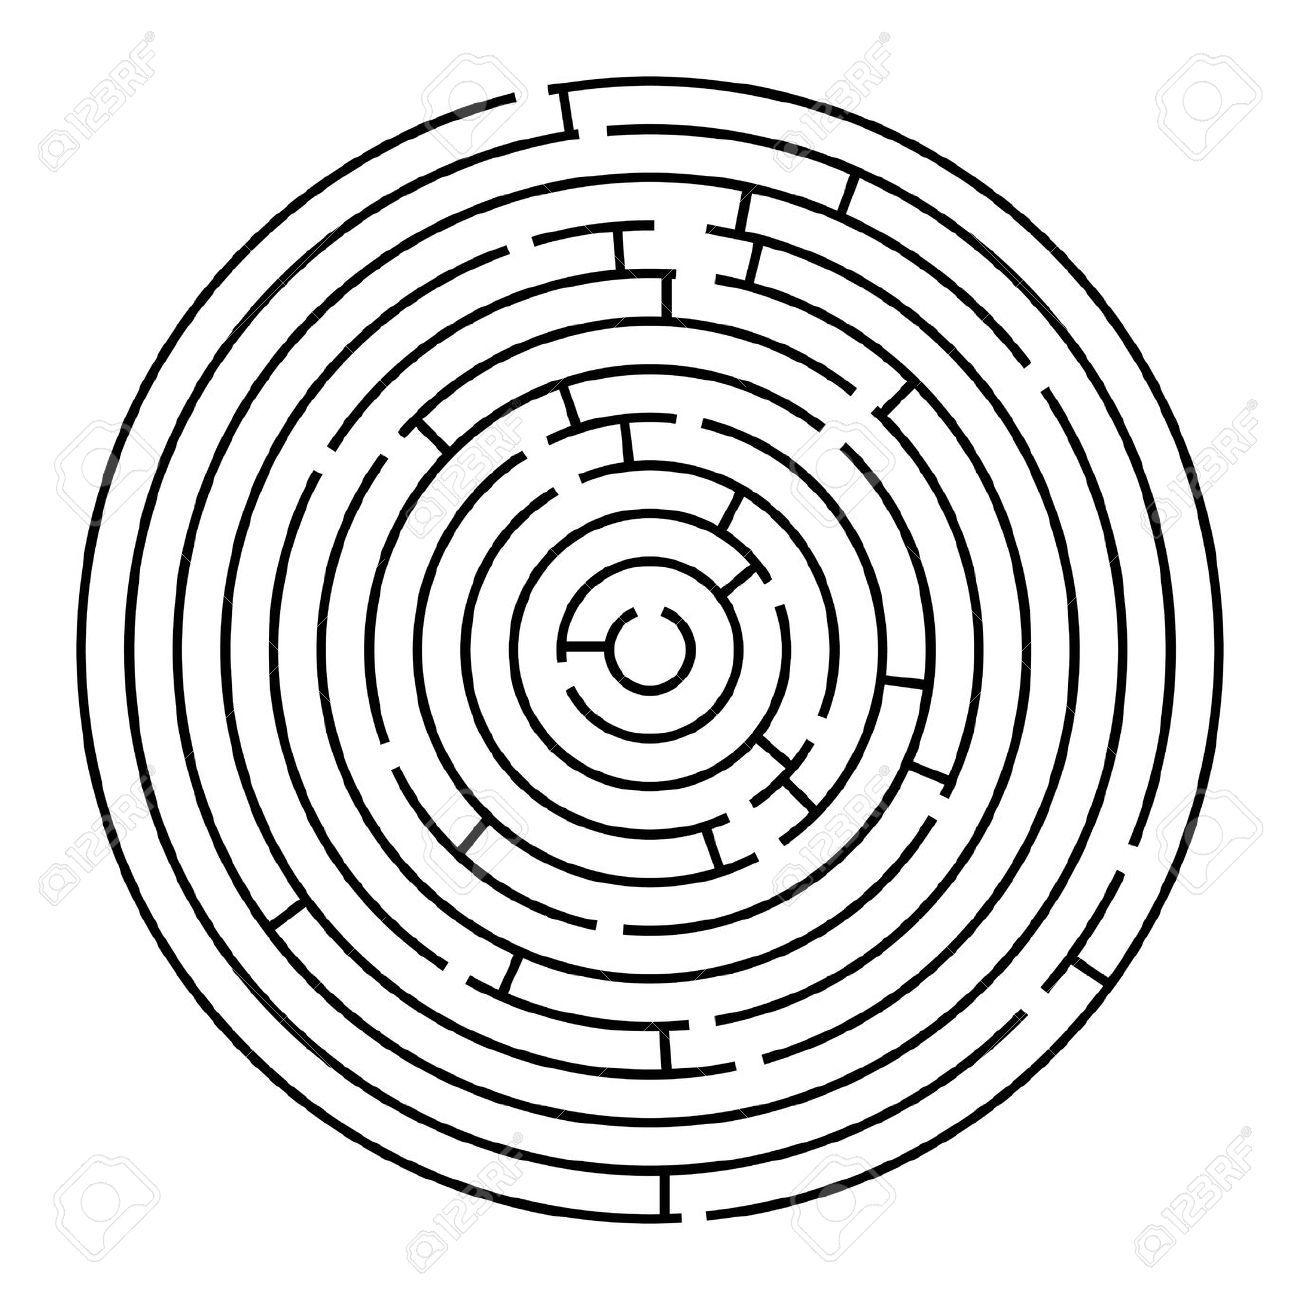 Laberinto Circular Vector